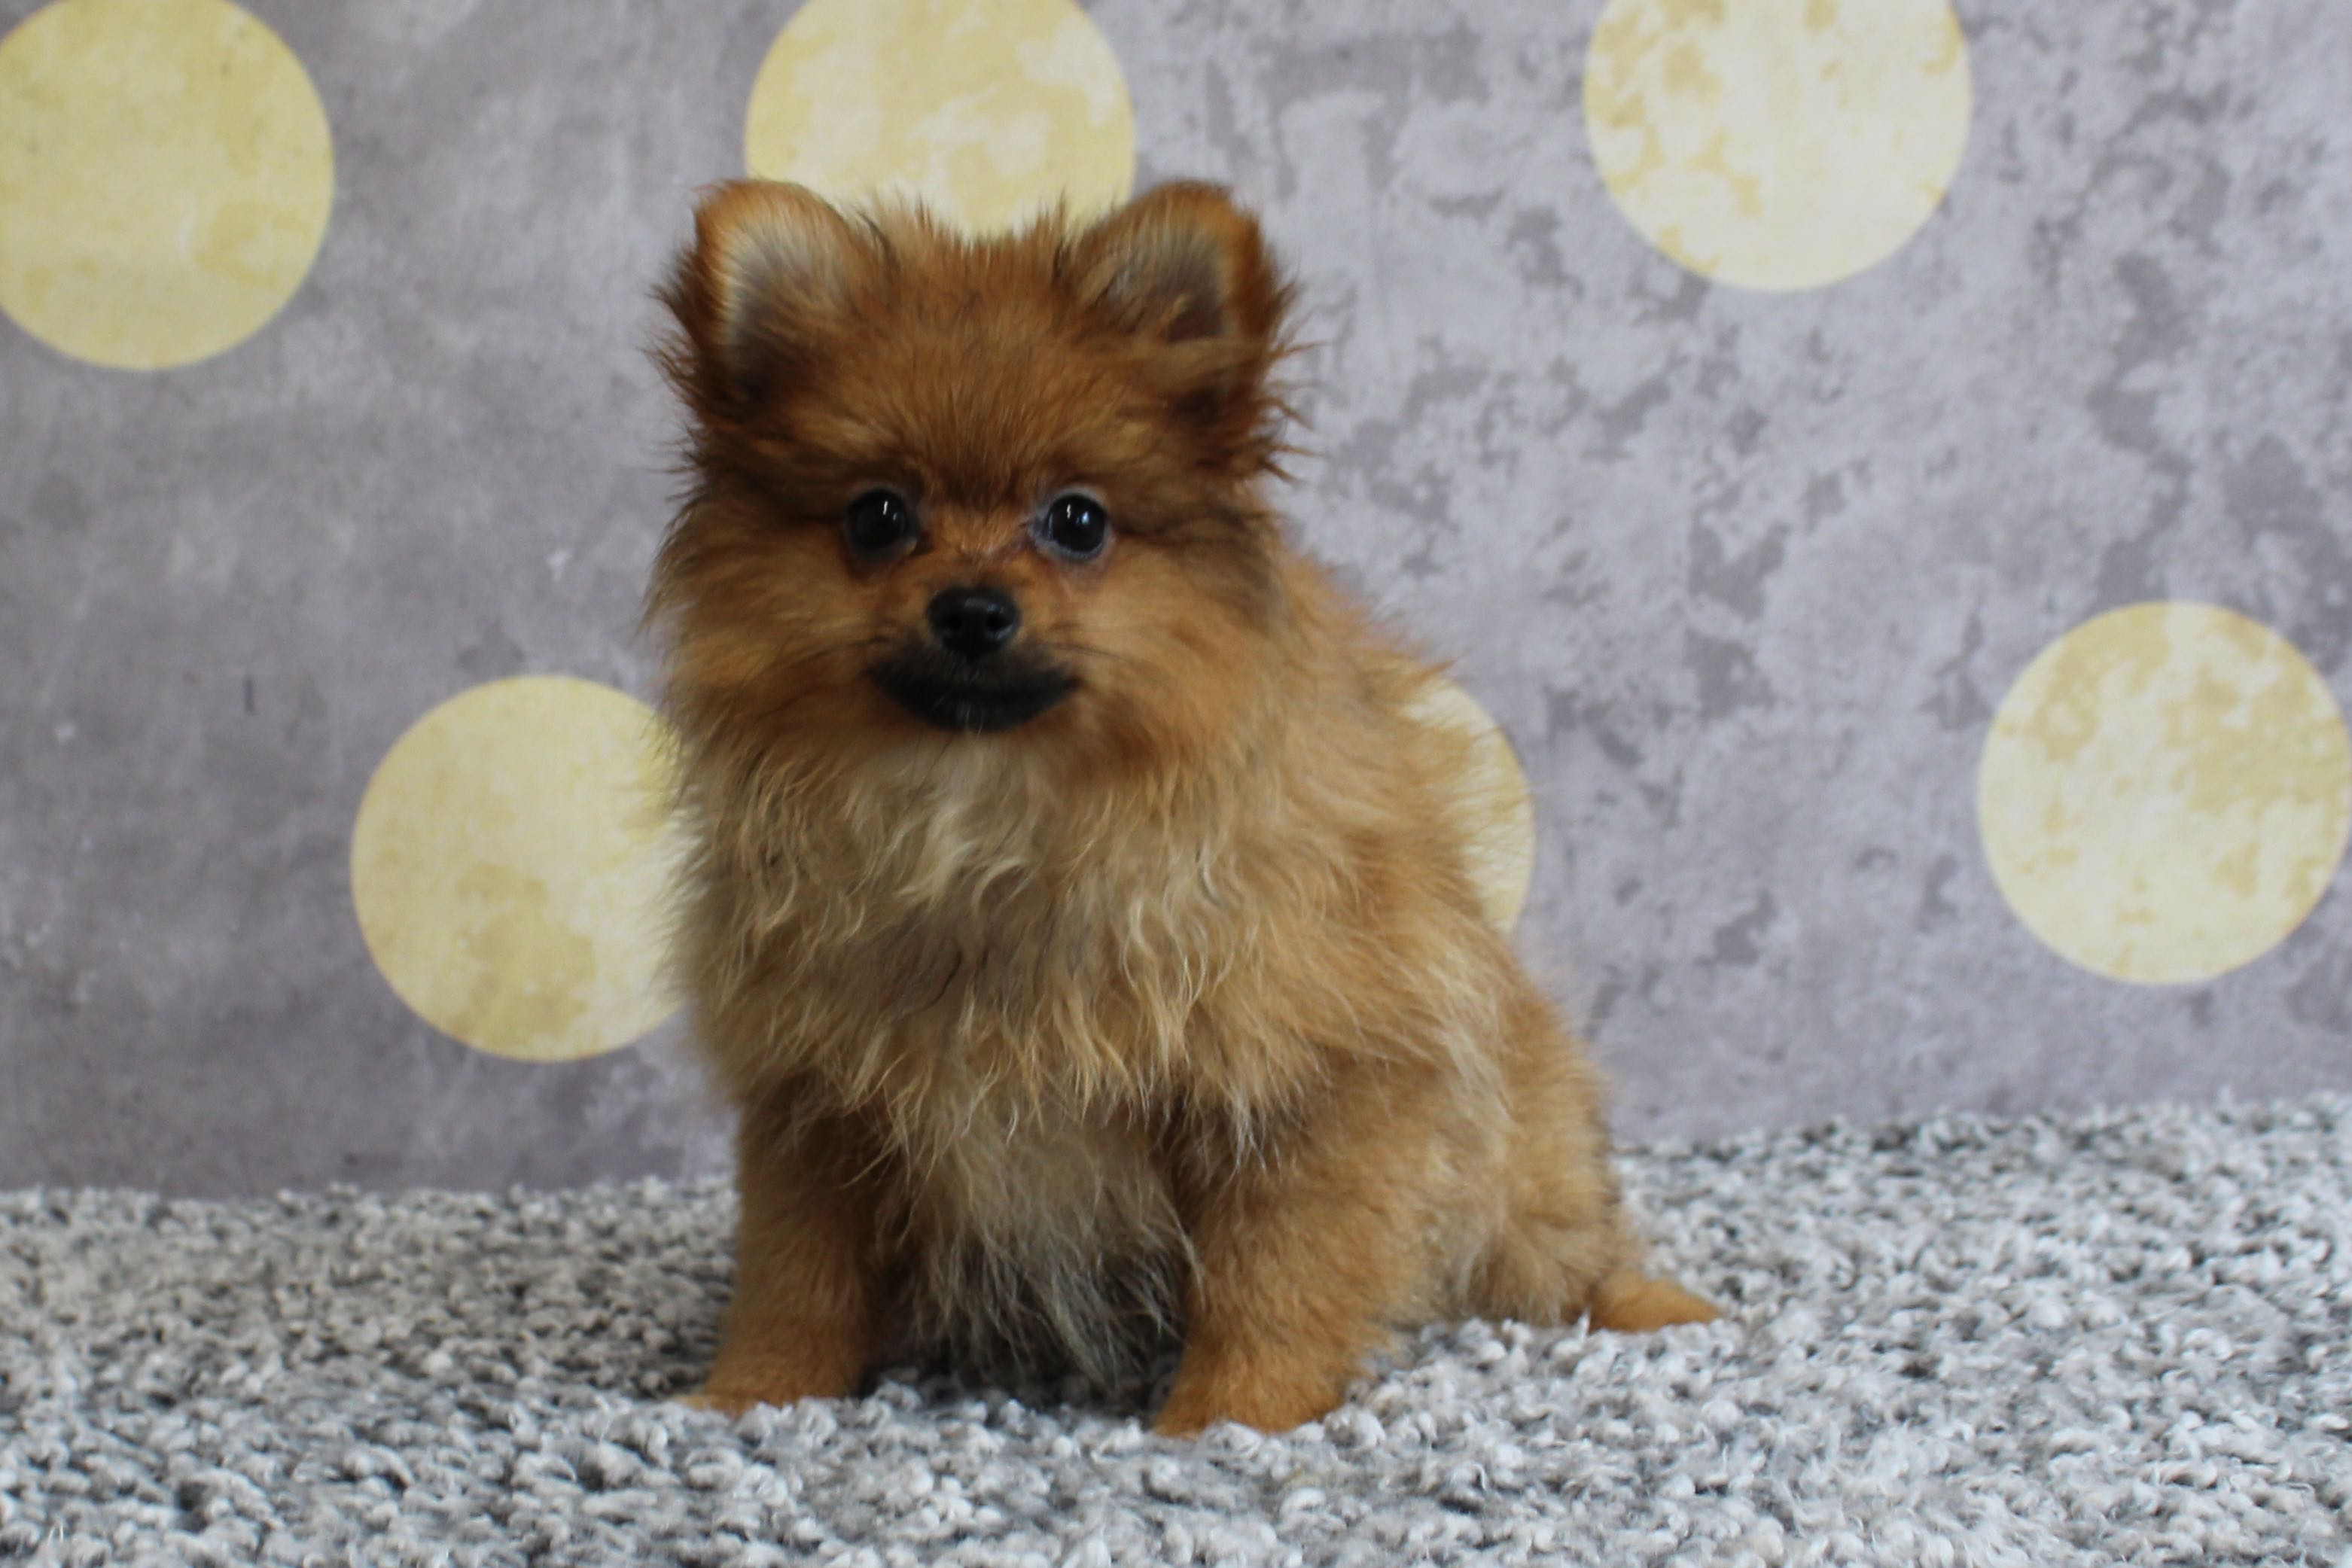 PomeranianHannah7794